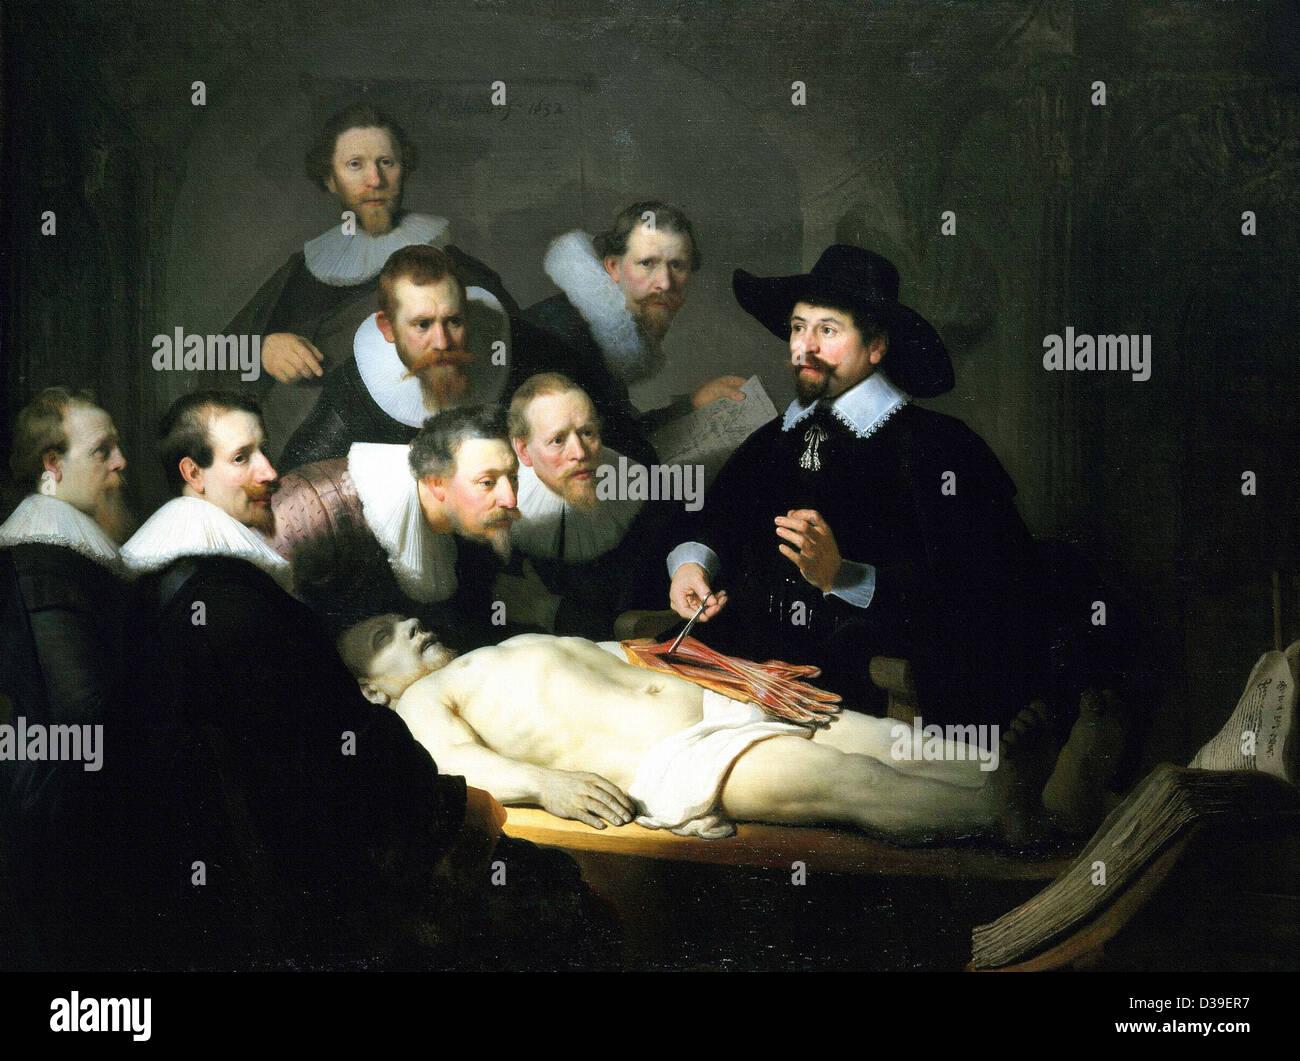 Rembrandt Van Rijn The Anatomy Lesson Of Dr Nicolaes Tulp 1632